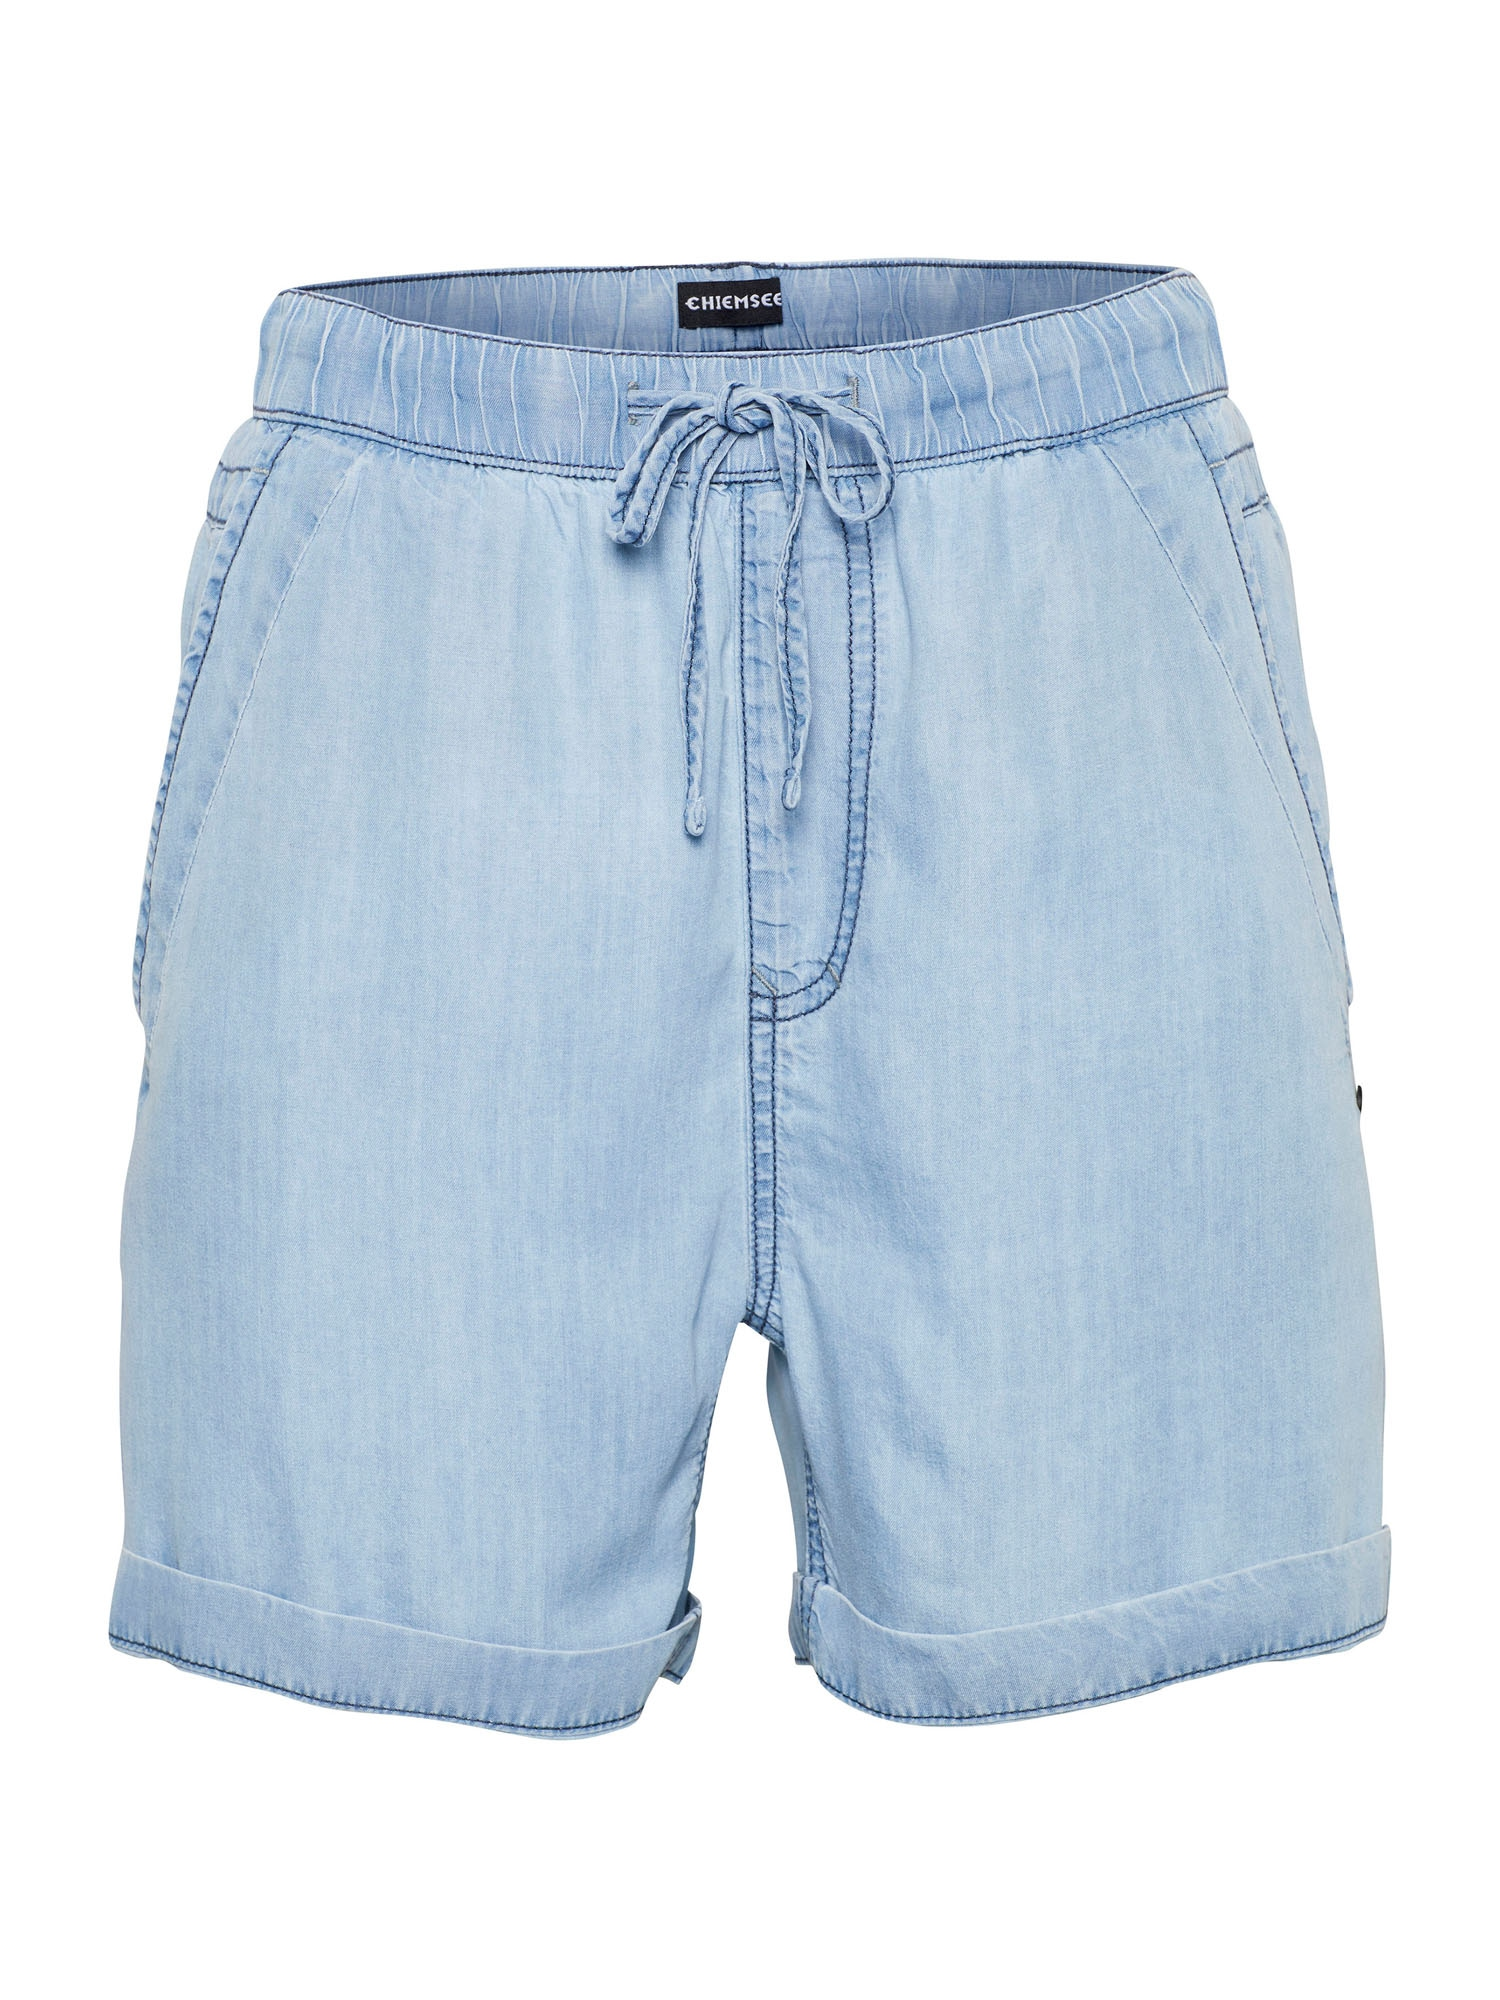 CHIEMSEE Kelnės mėlyna